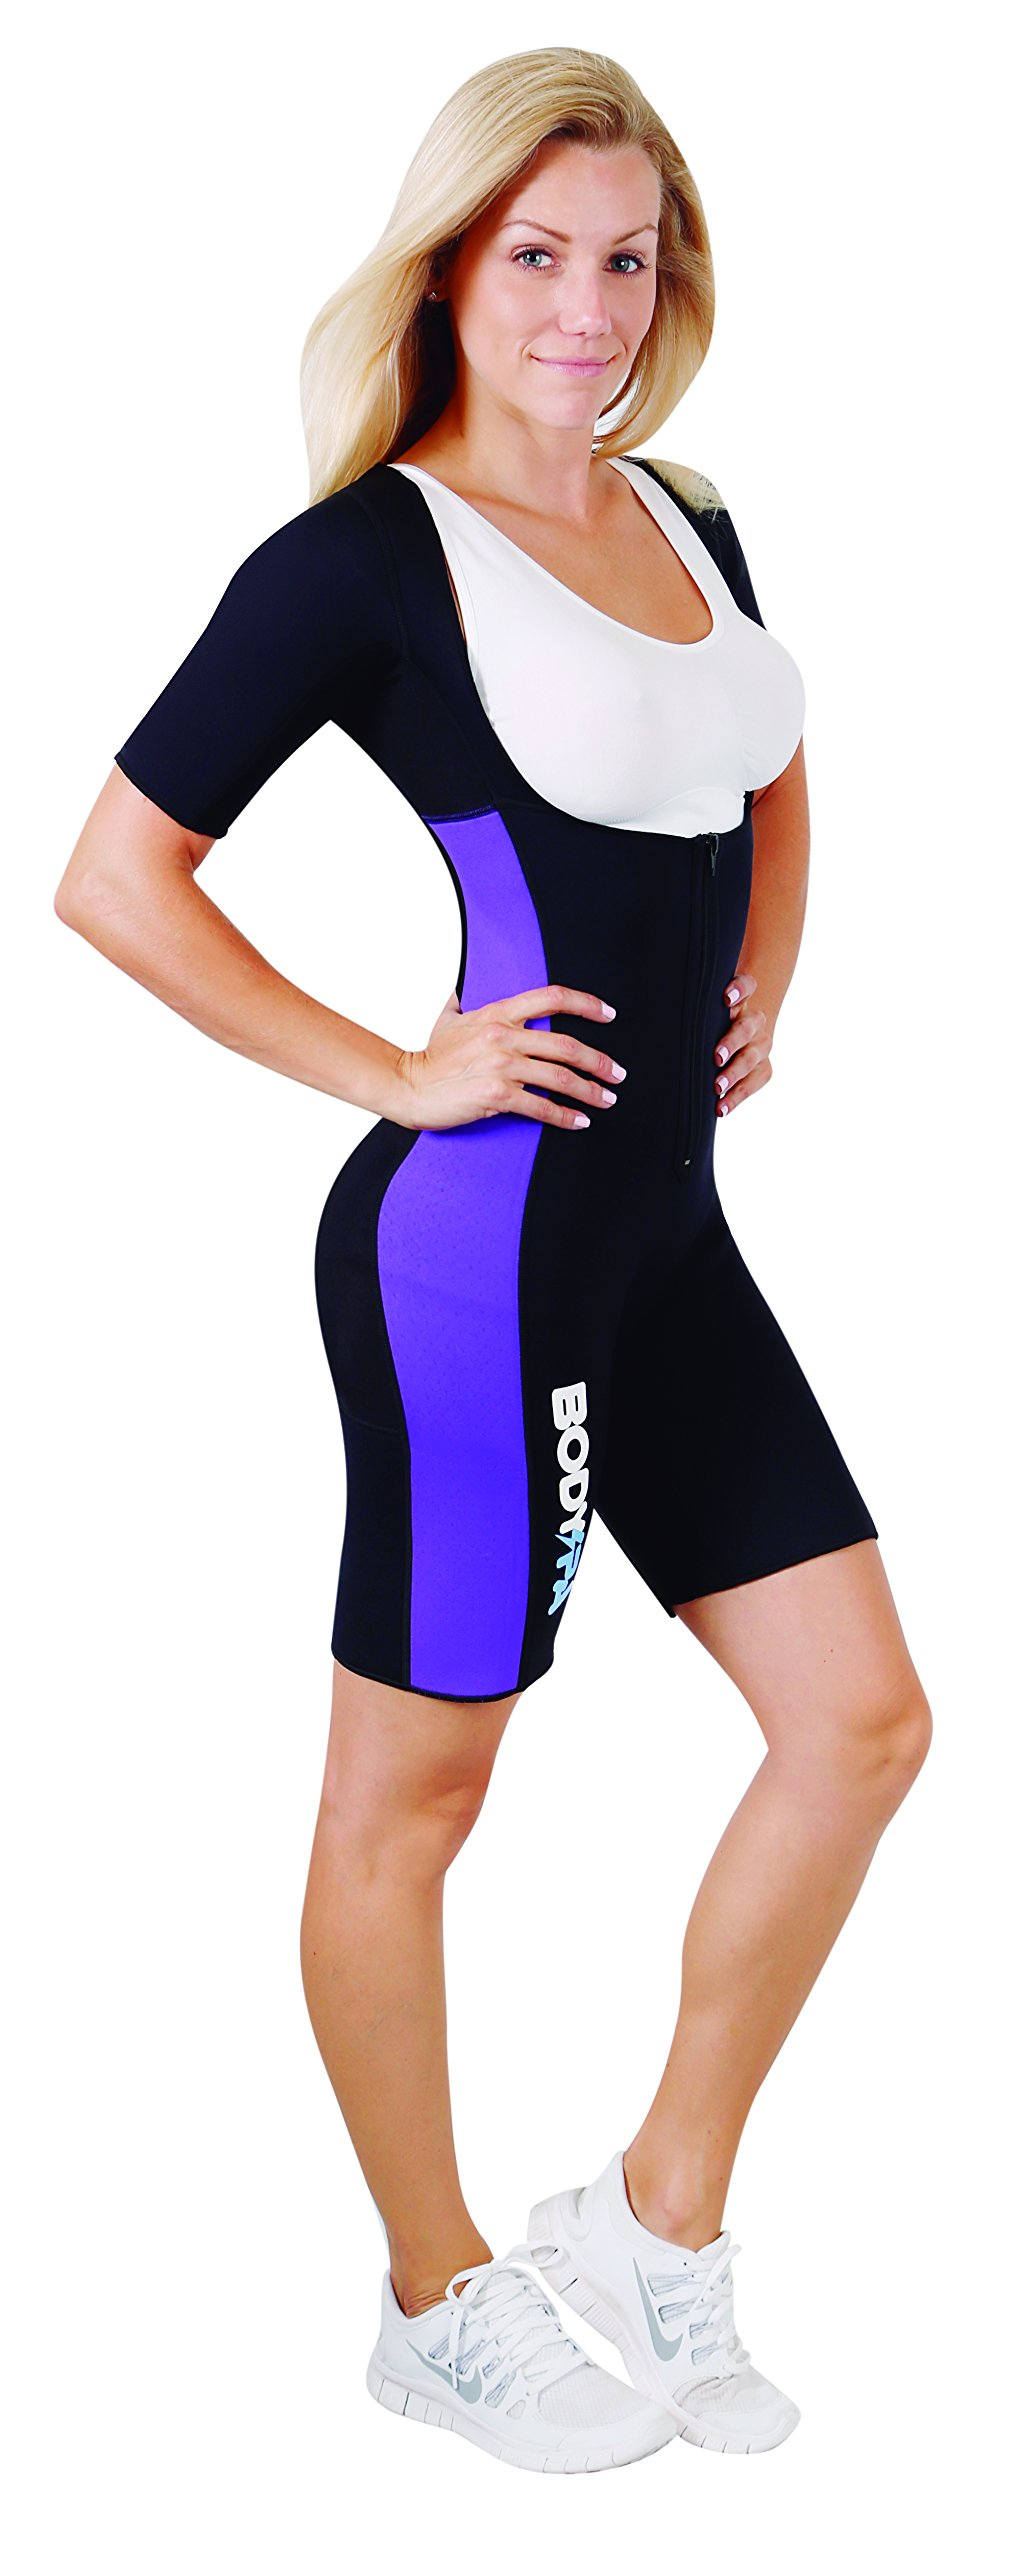 Body Spa Light Body Sauna Suit Neoprene Full Body Shaper Gym Sport Aerobic (Purple, Medium) 13832